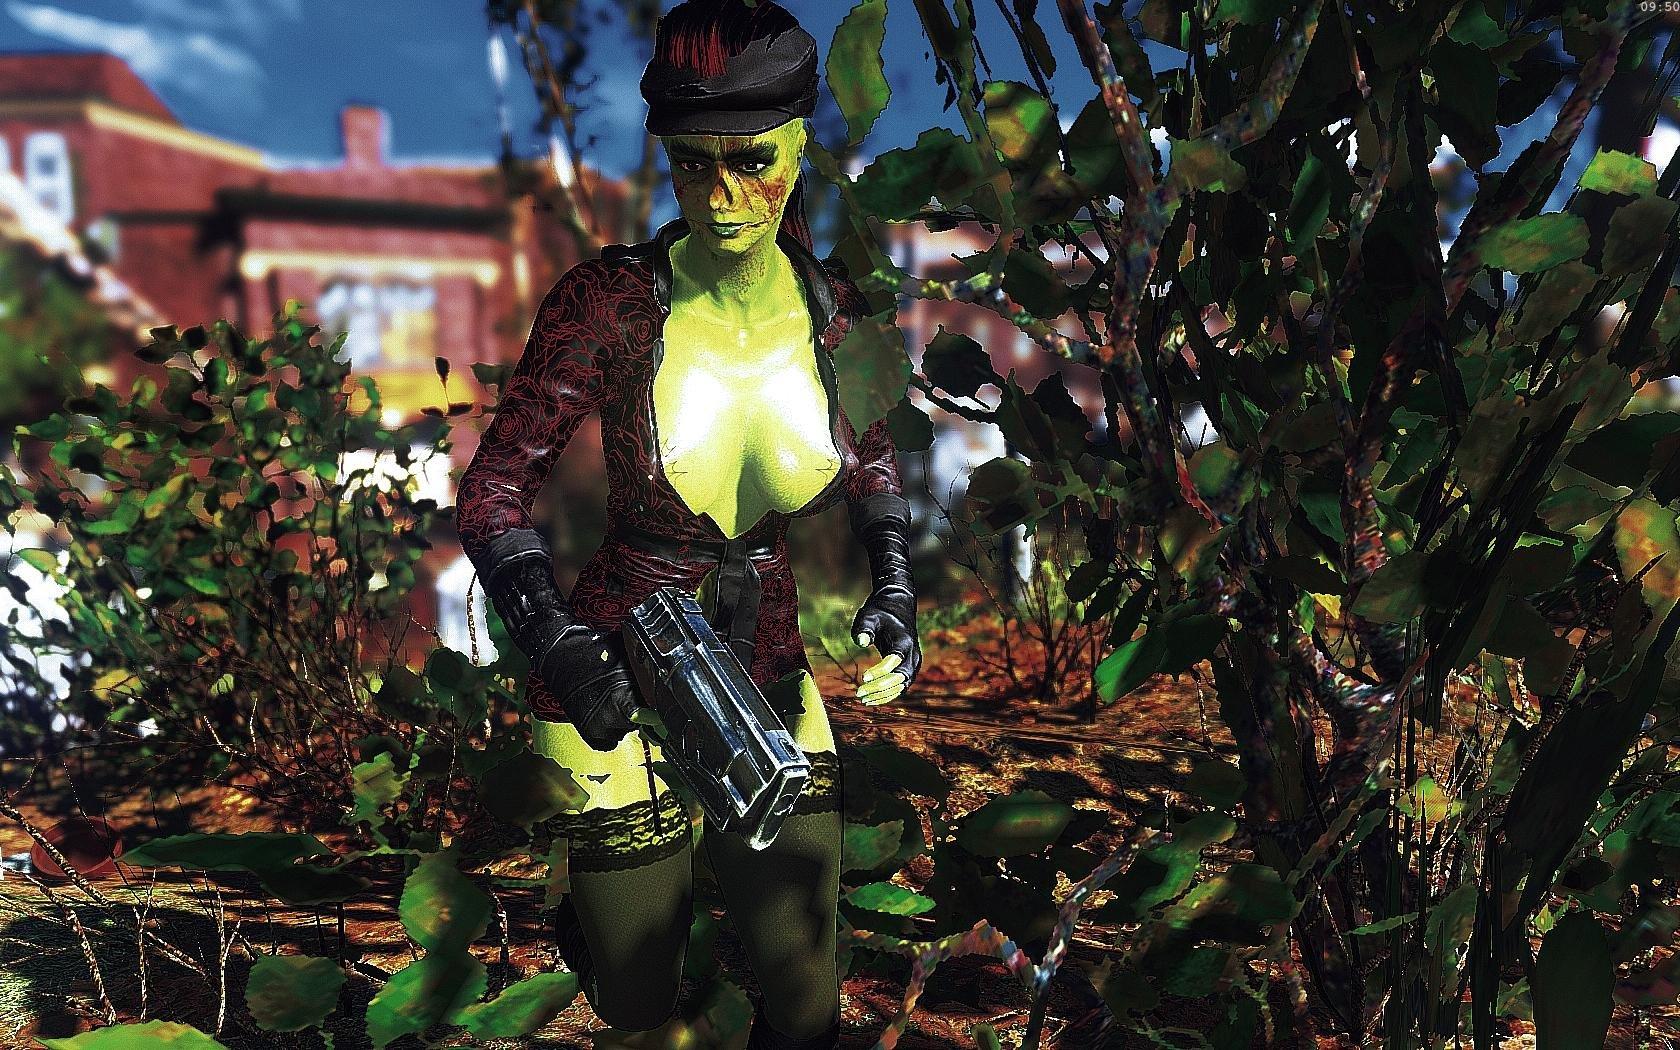 Fallout4 2019-05-28 09-50-42-40